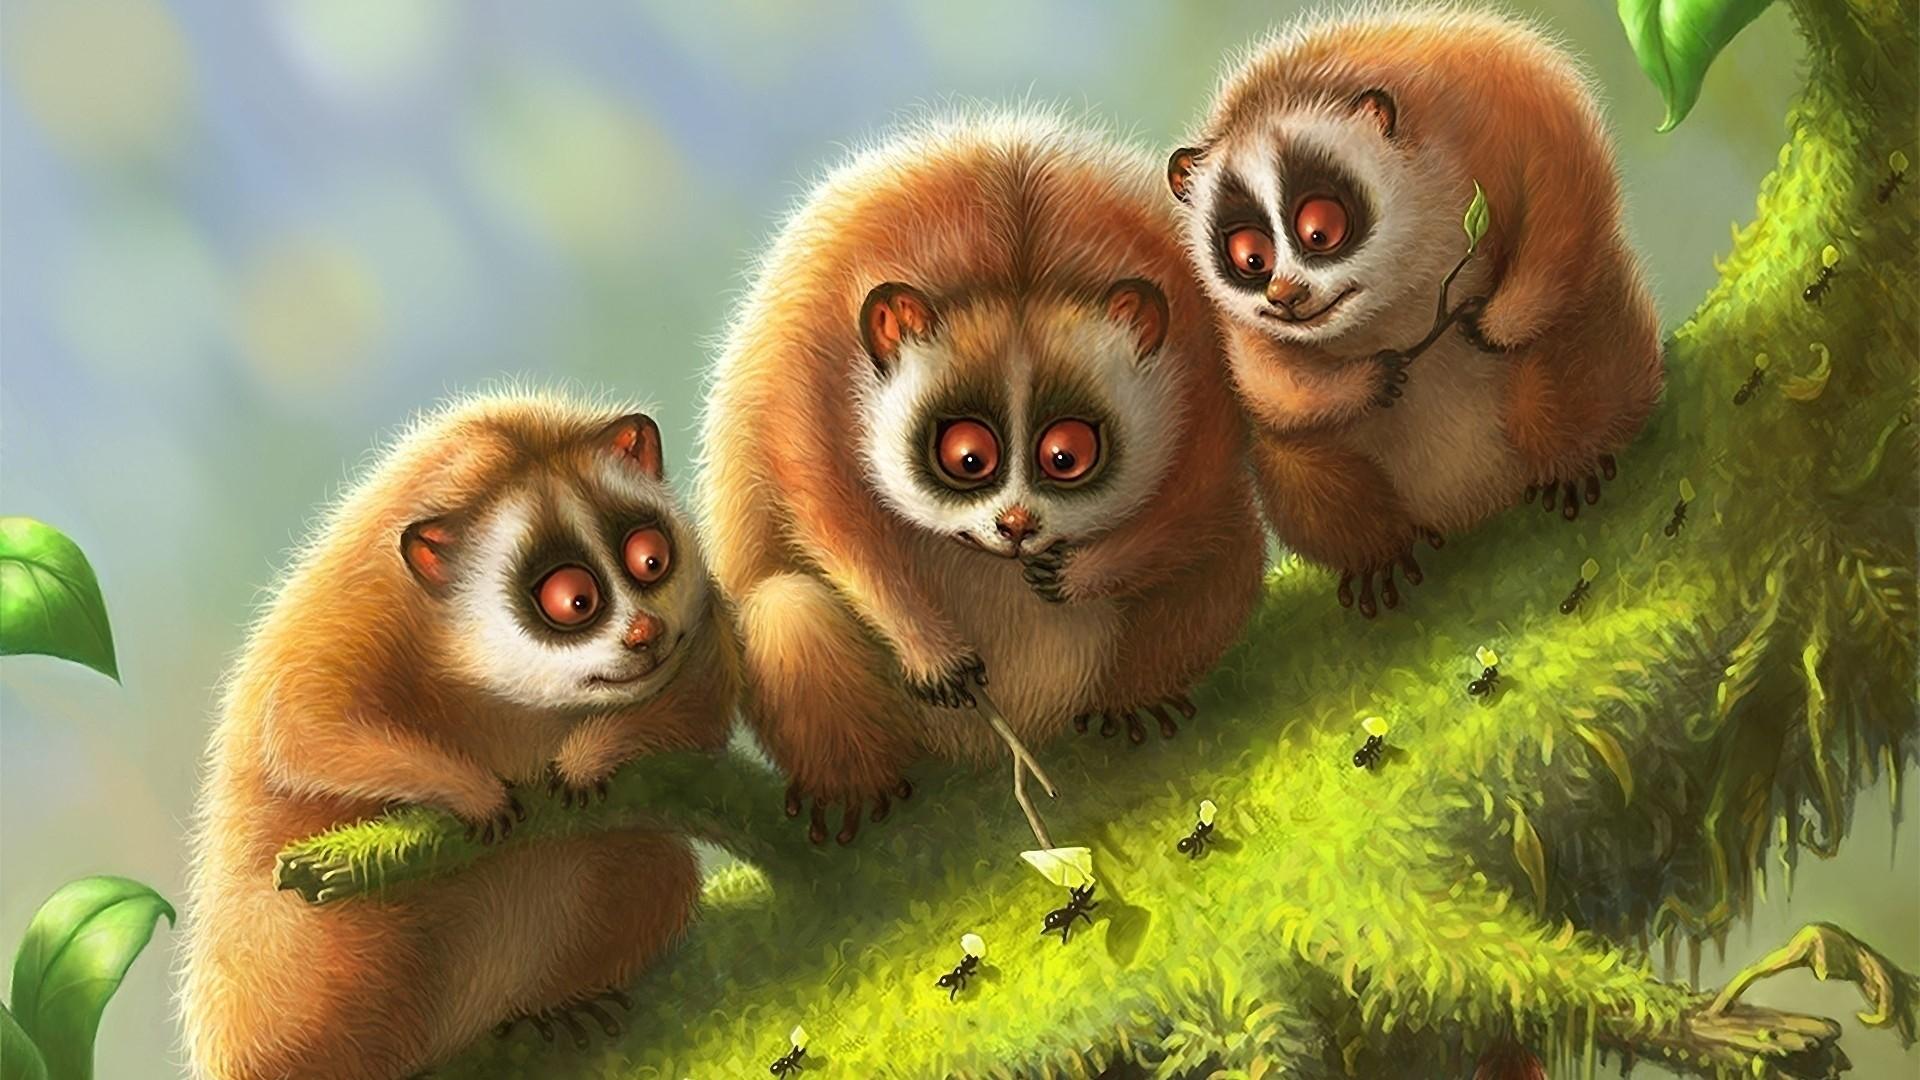 Res: 1920x1080, Lemur Wallpapers